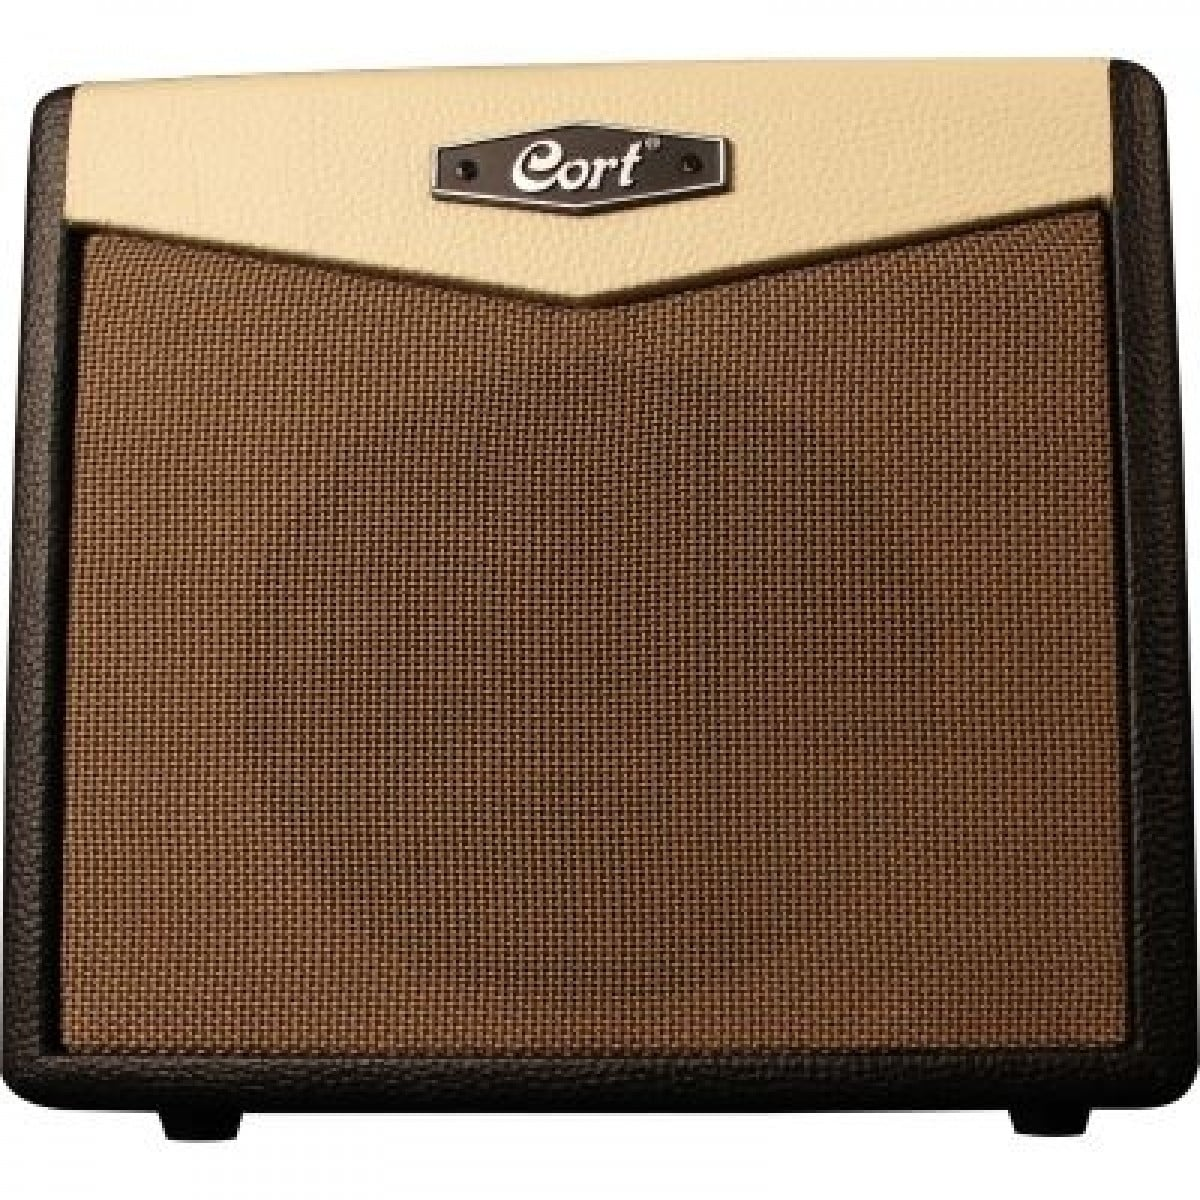 Cort-CM15R-BK-Amplifier-Gitar